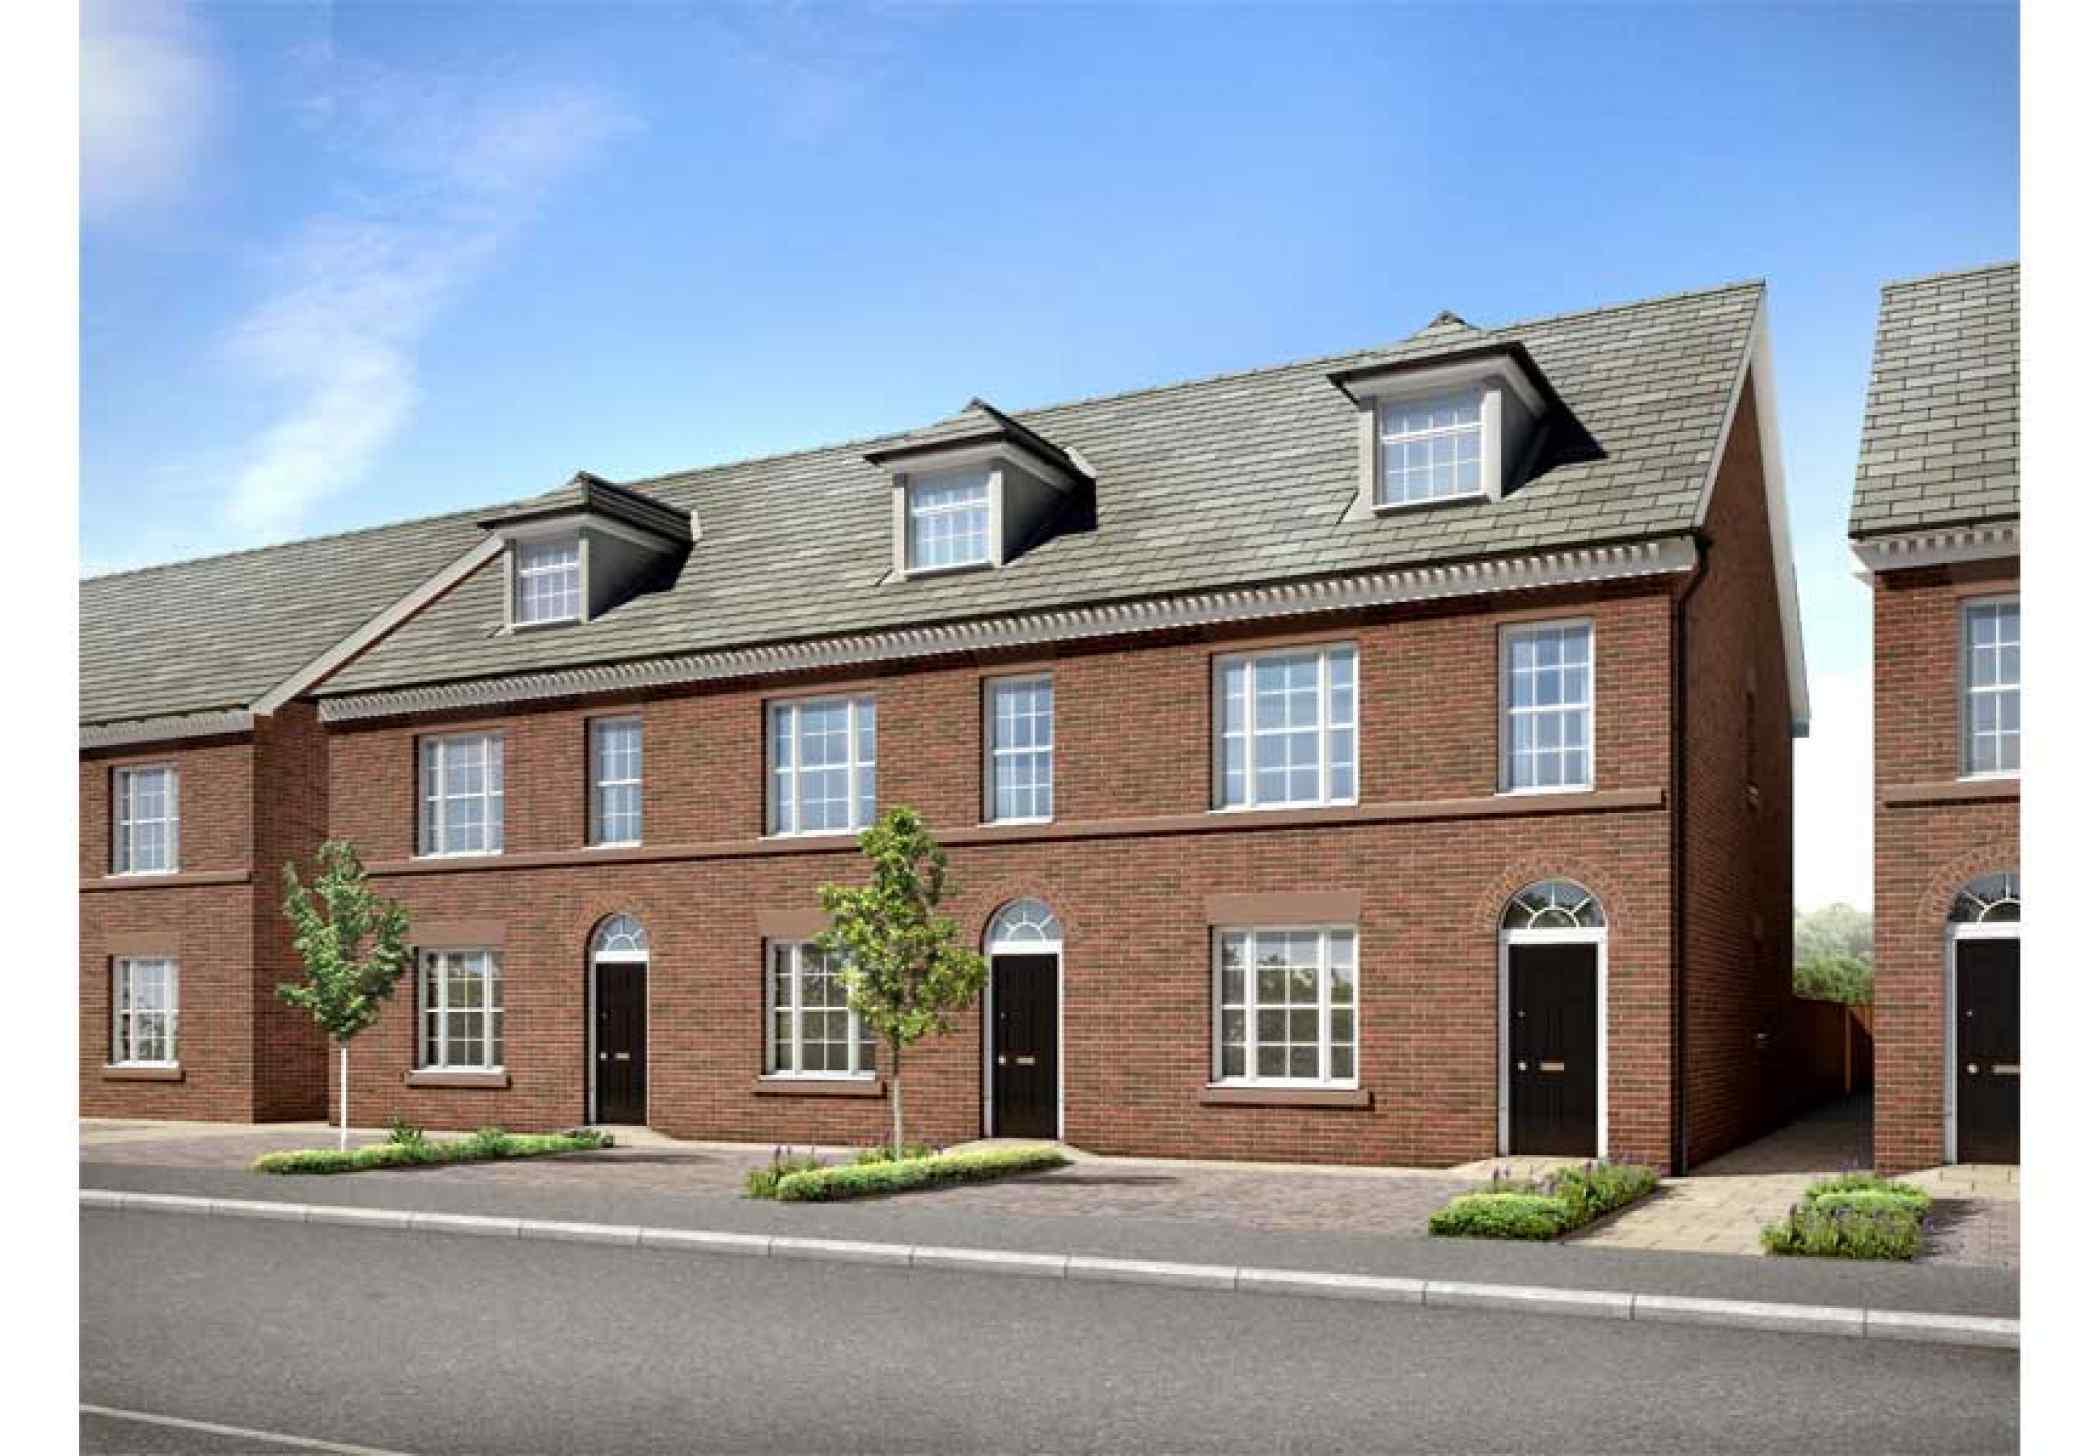 HM Stanley house type 2 exterior design